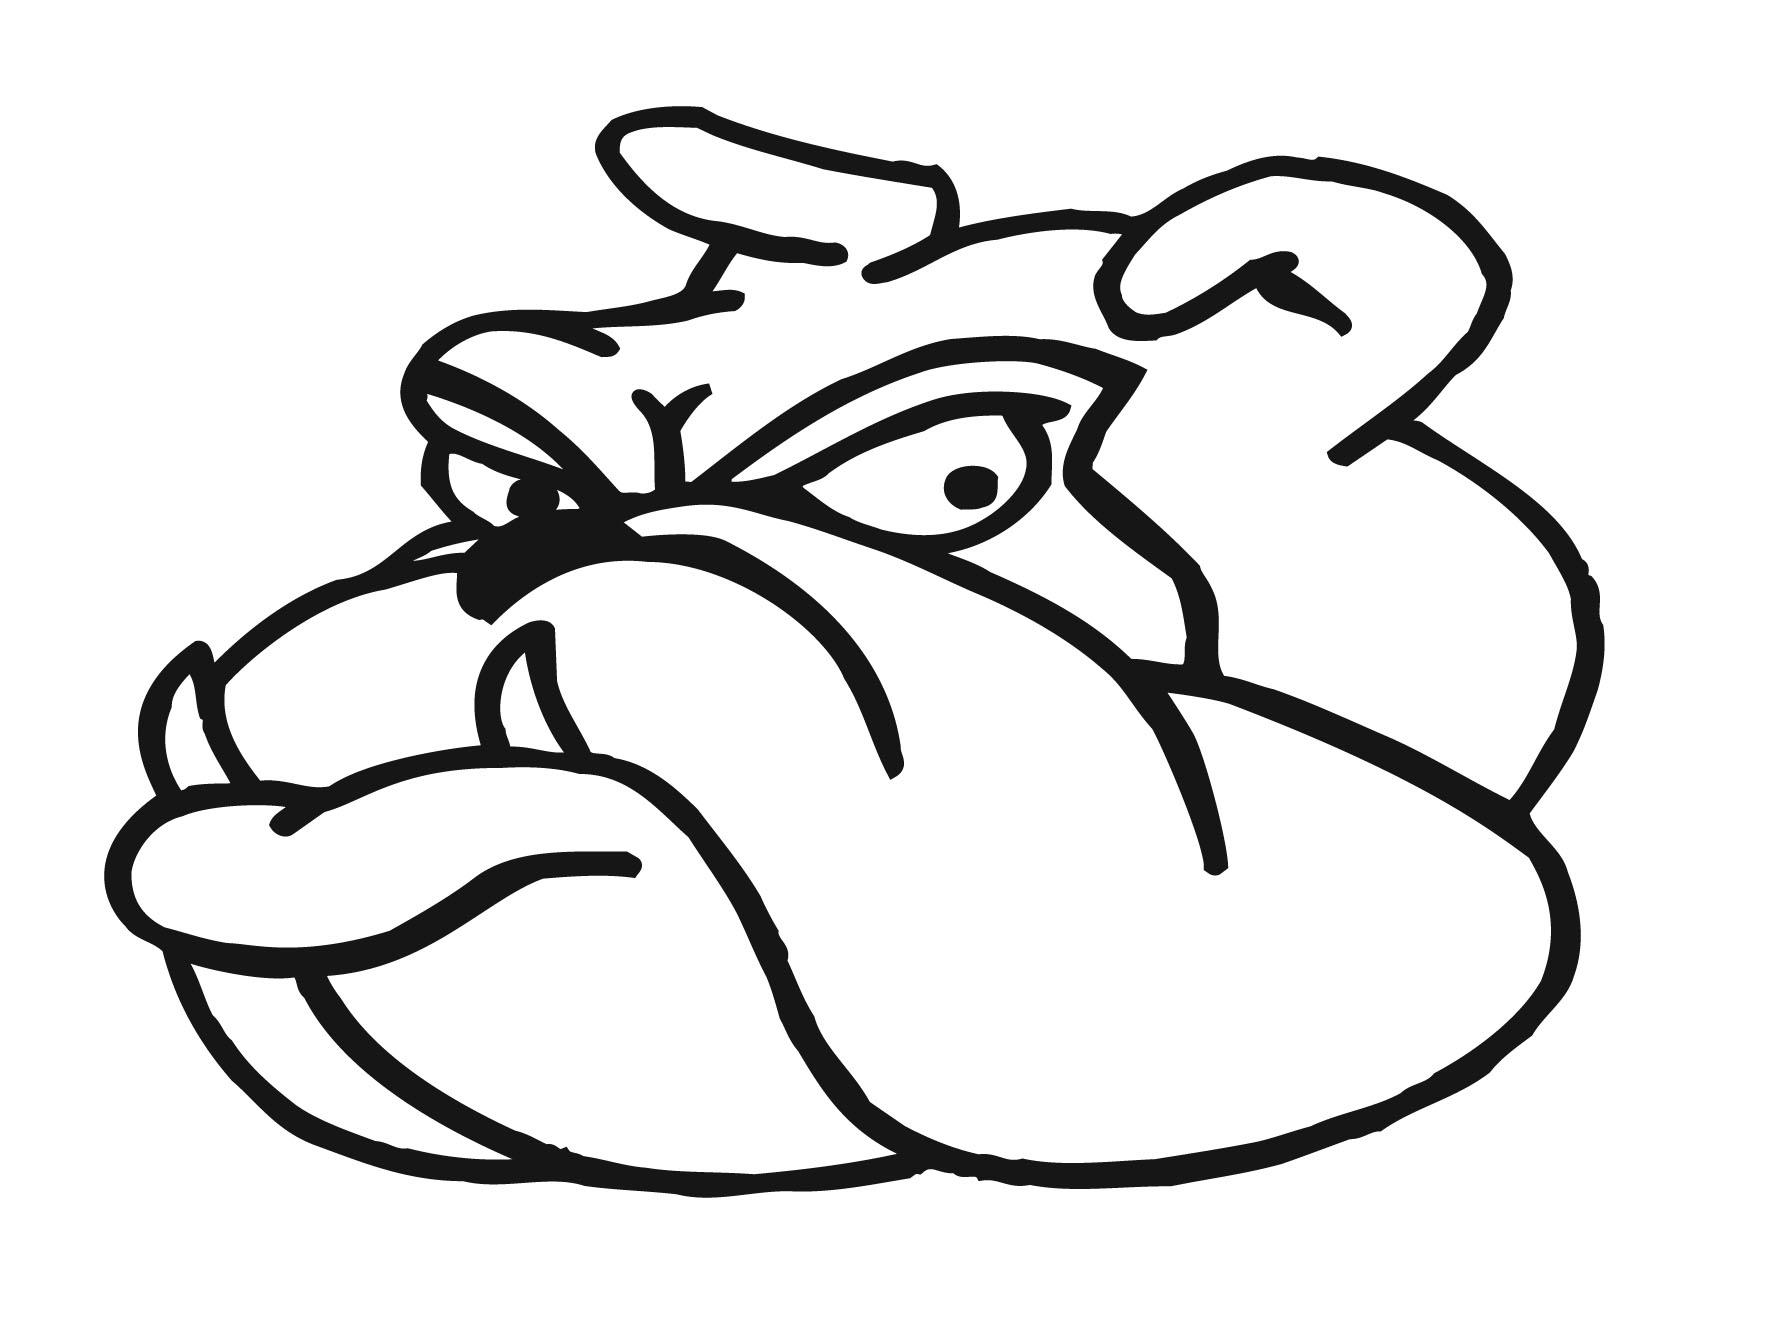 Bulldog clipart animated. Free download clip art